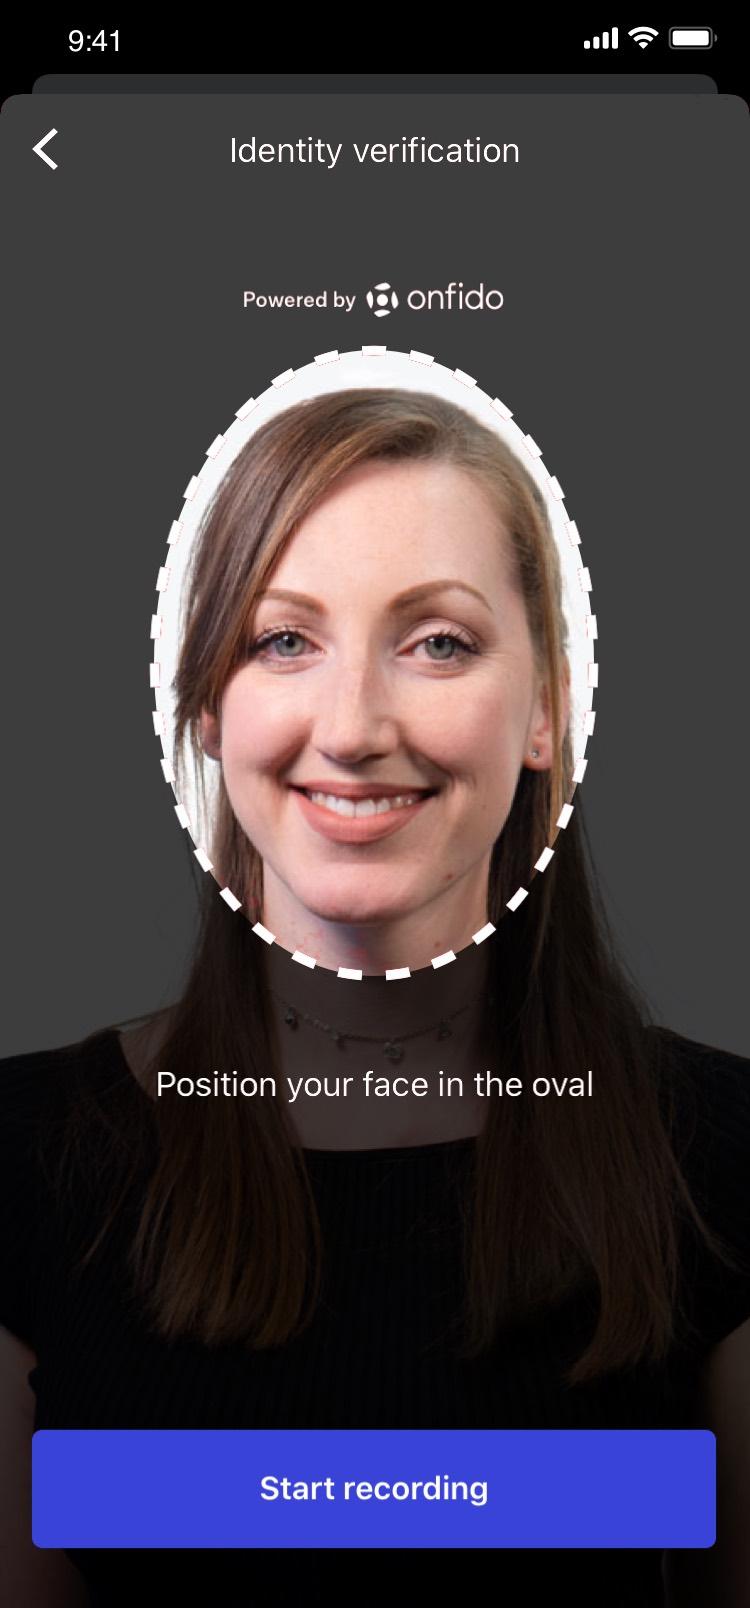 John Charcol Mobile App Face ID